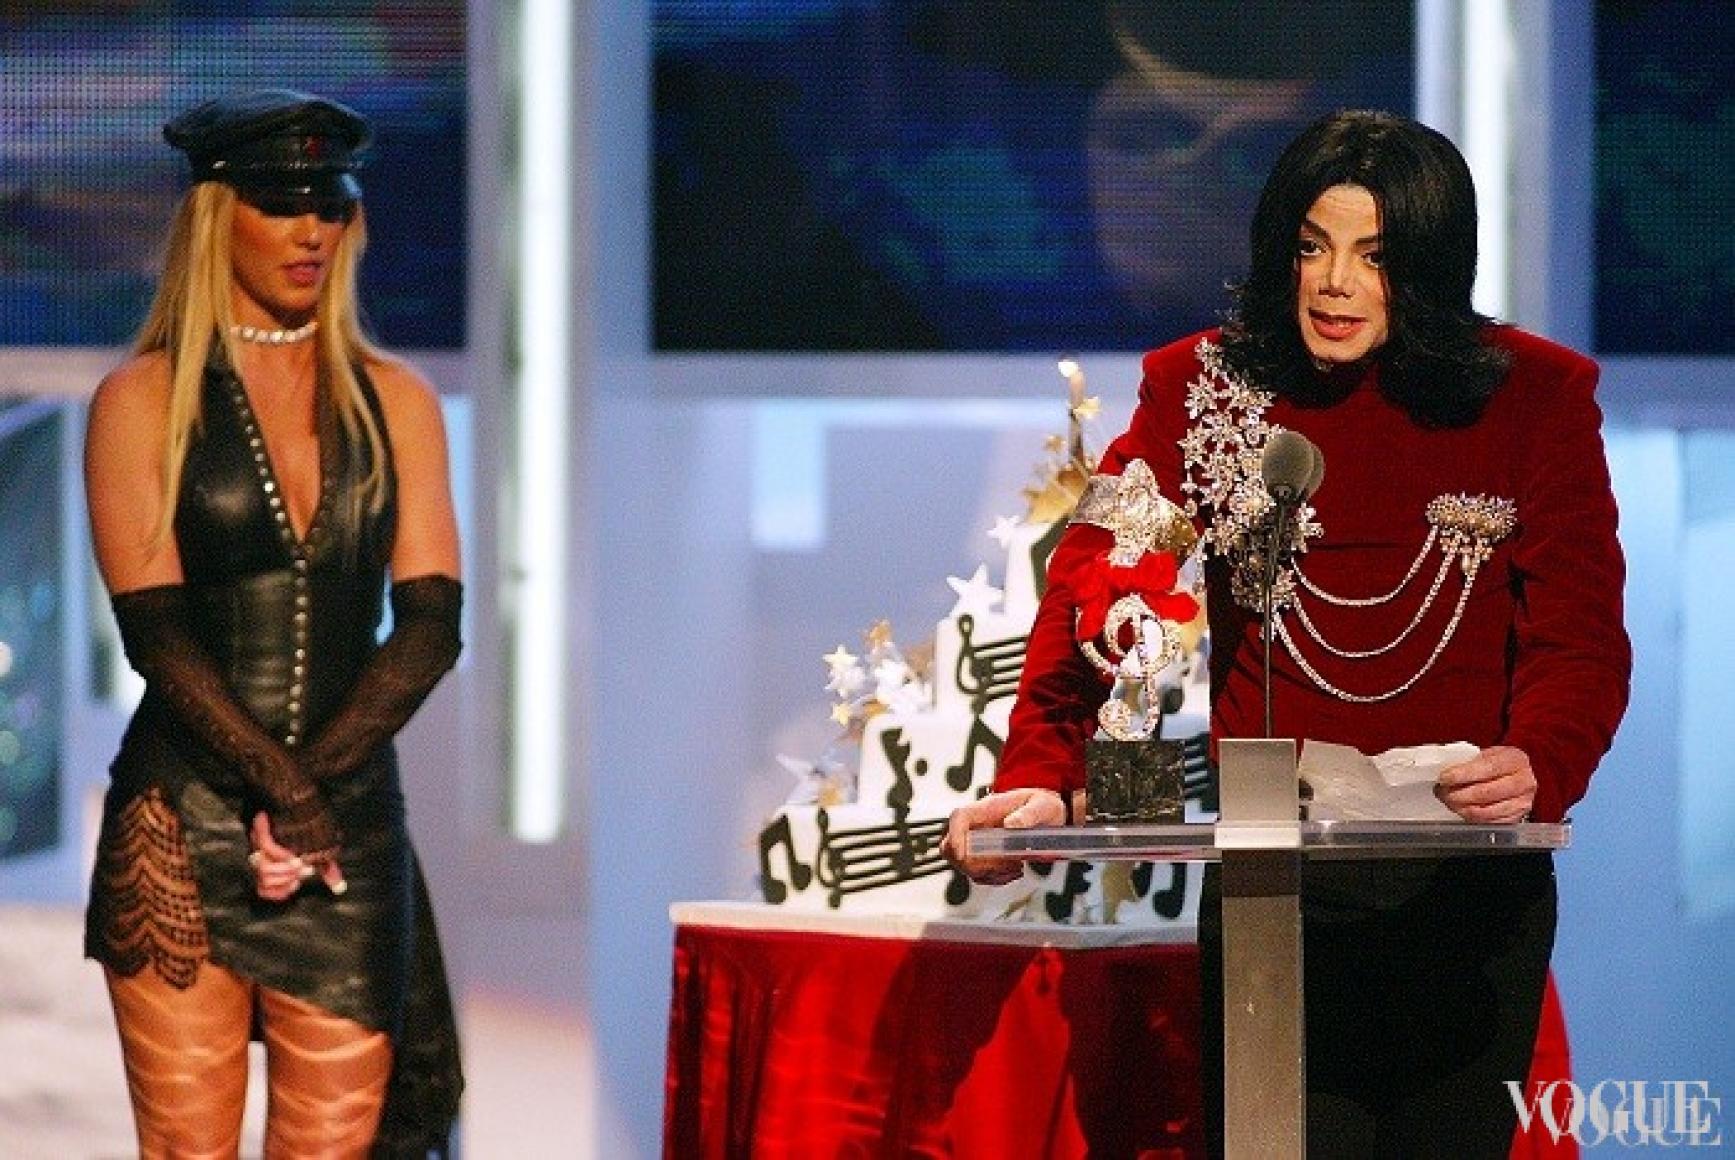 Бритни Спирс и Майкл Джексон, 2002